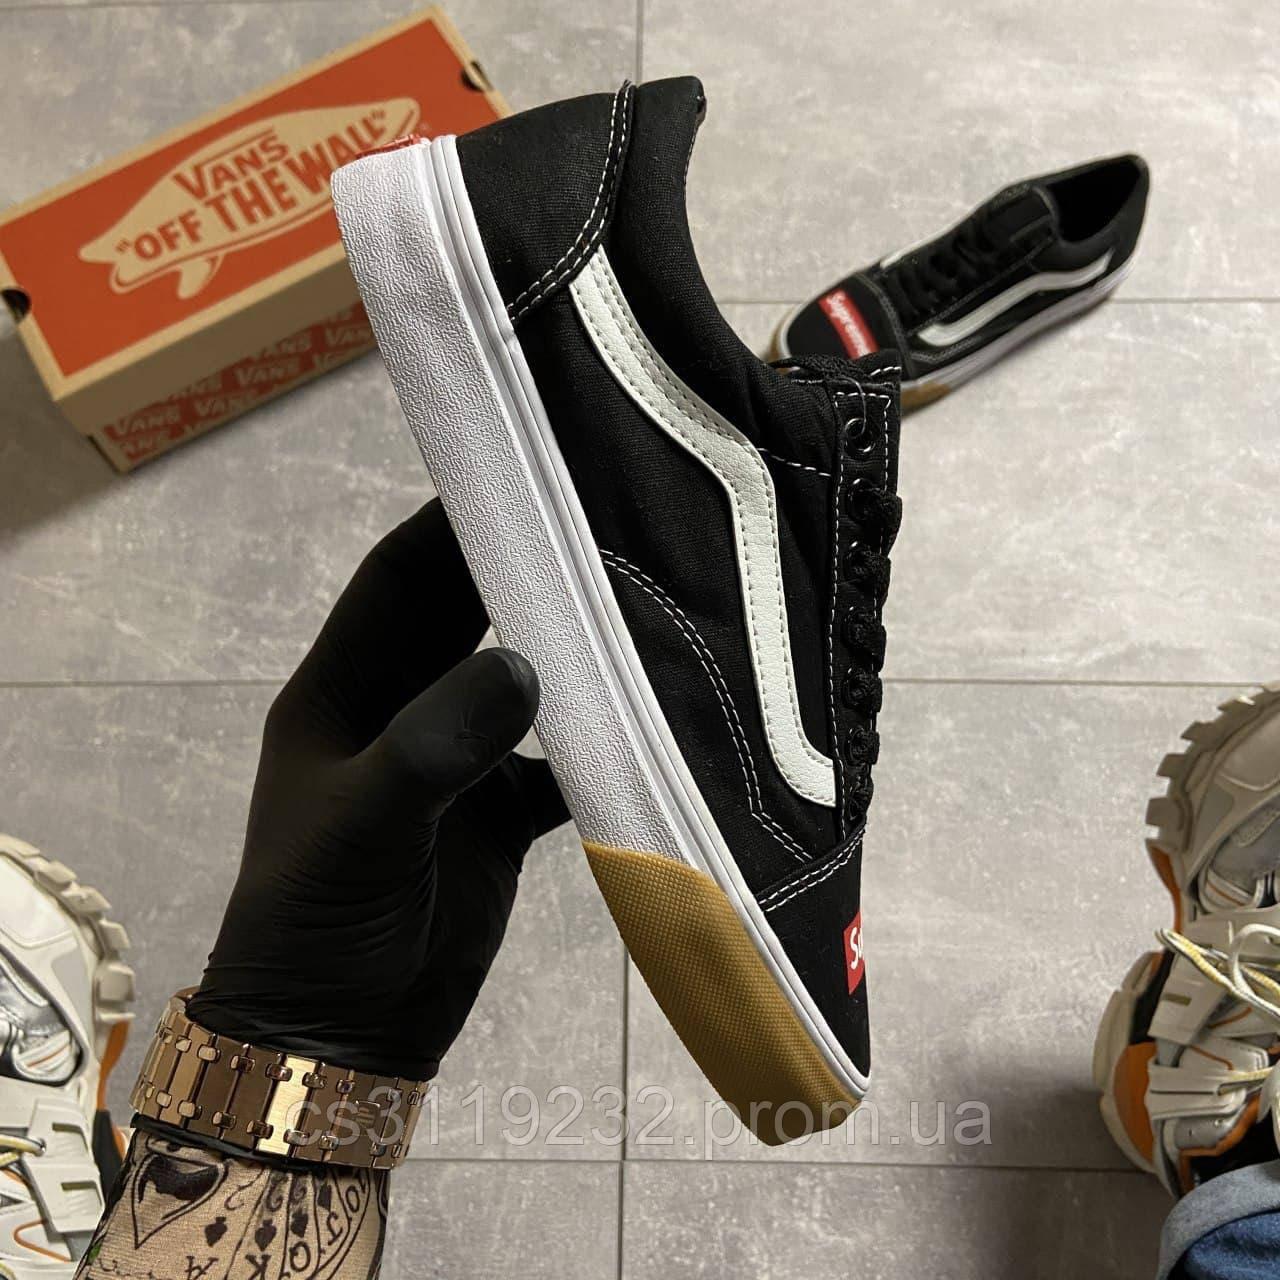 Мужские кеды Vans Old Skool Black/White SUPREME (черные)